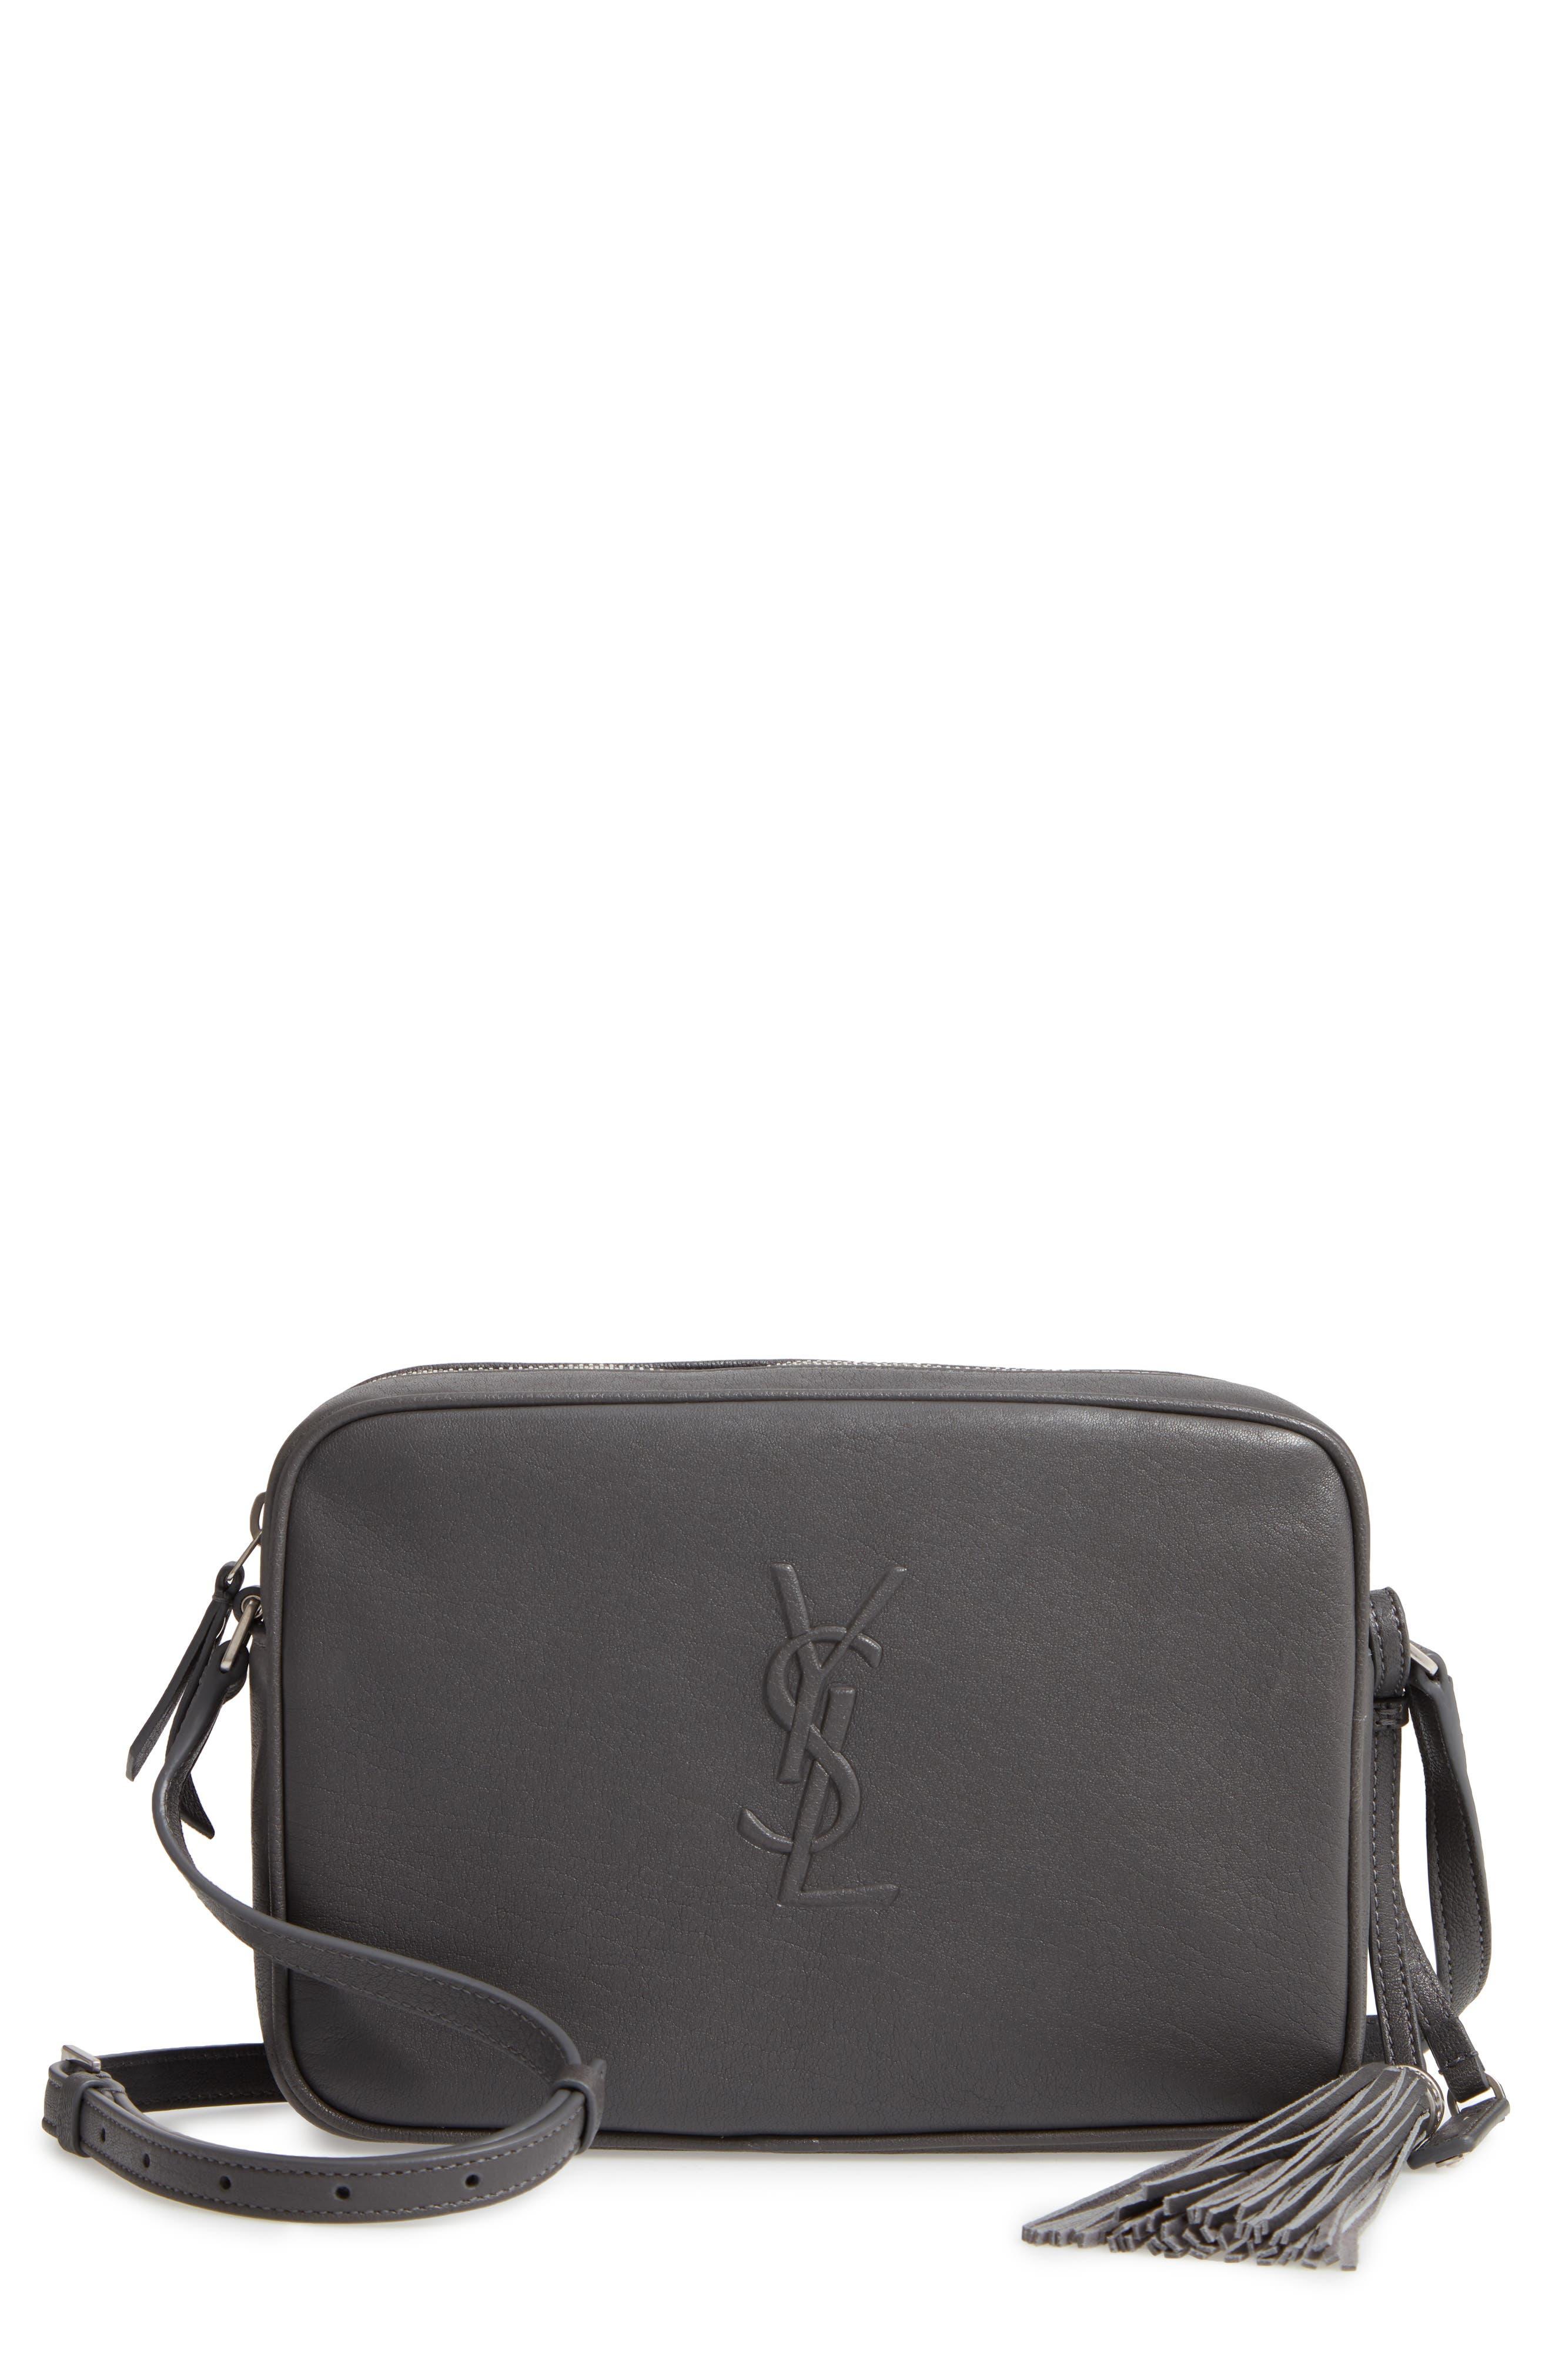 SAINT LAURENT, Small Mono Leather Camera Bag, Main thumbnail 1, color, STORM